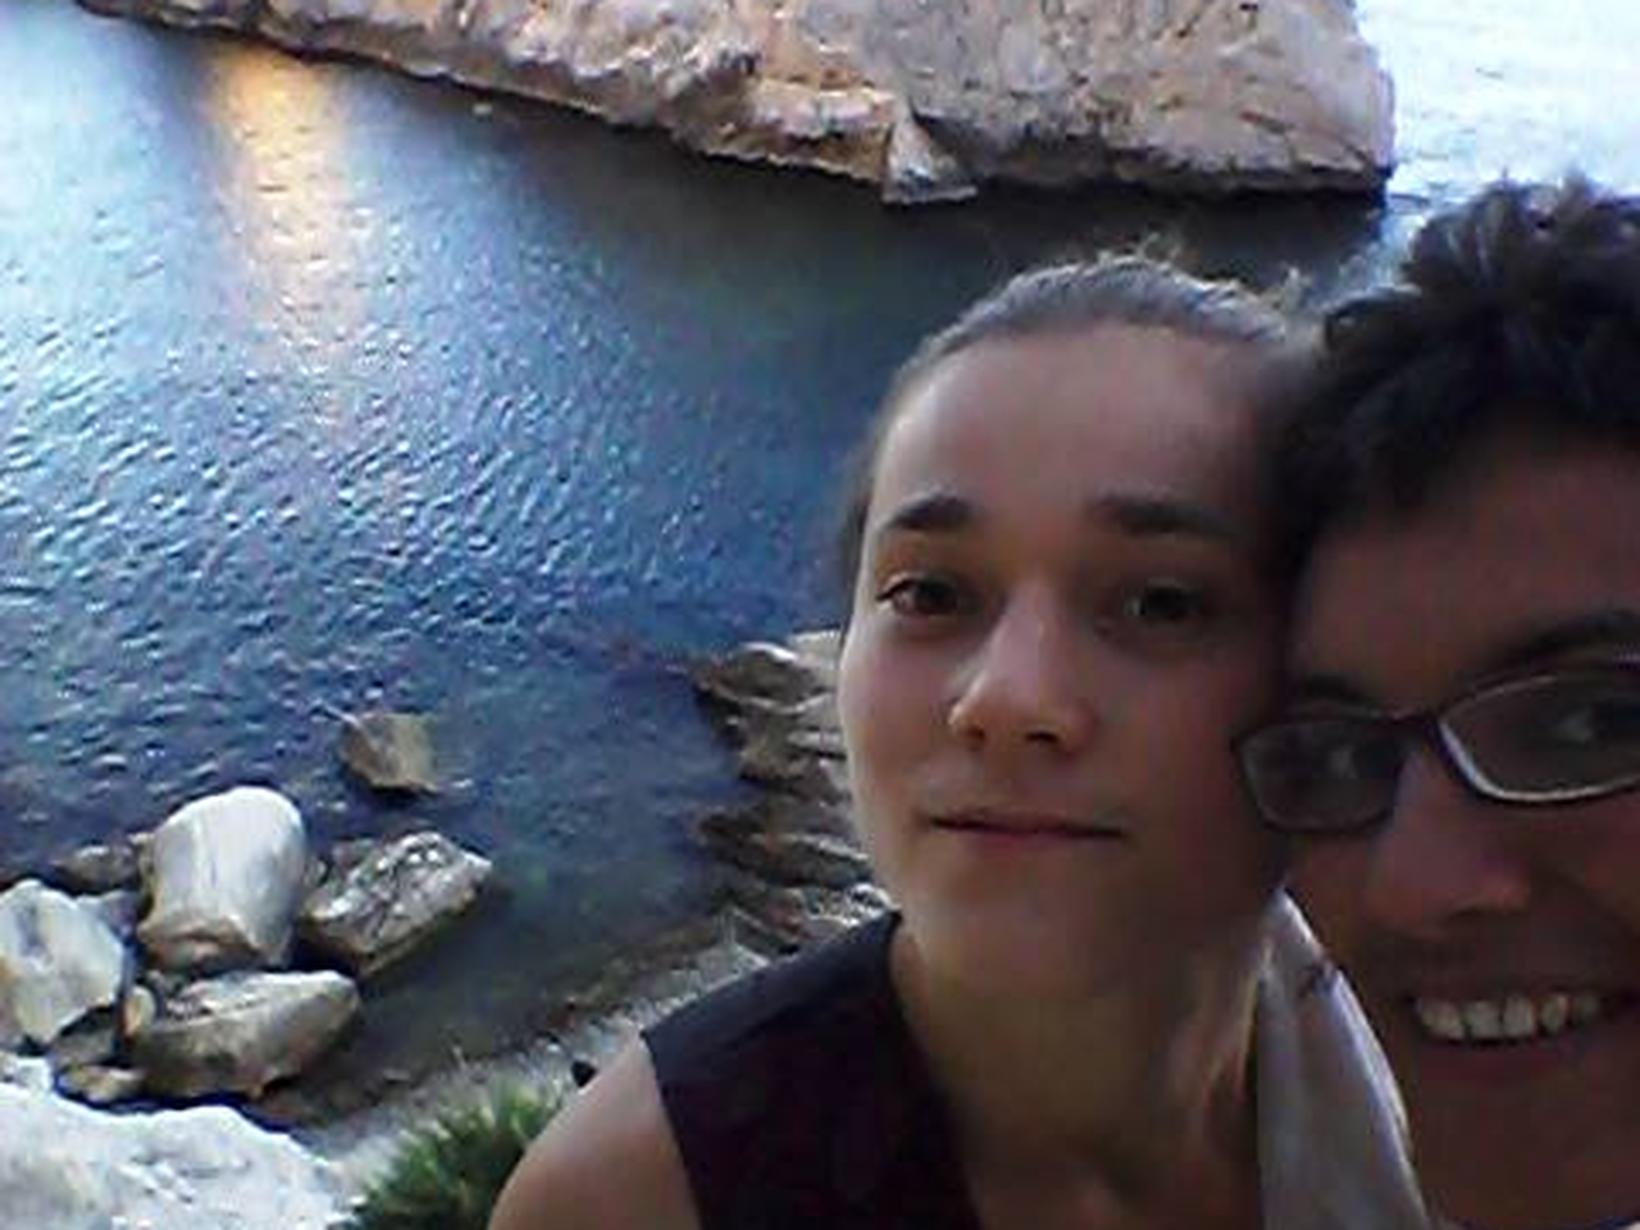 Celeste & Mariia from Barcelona, Spain